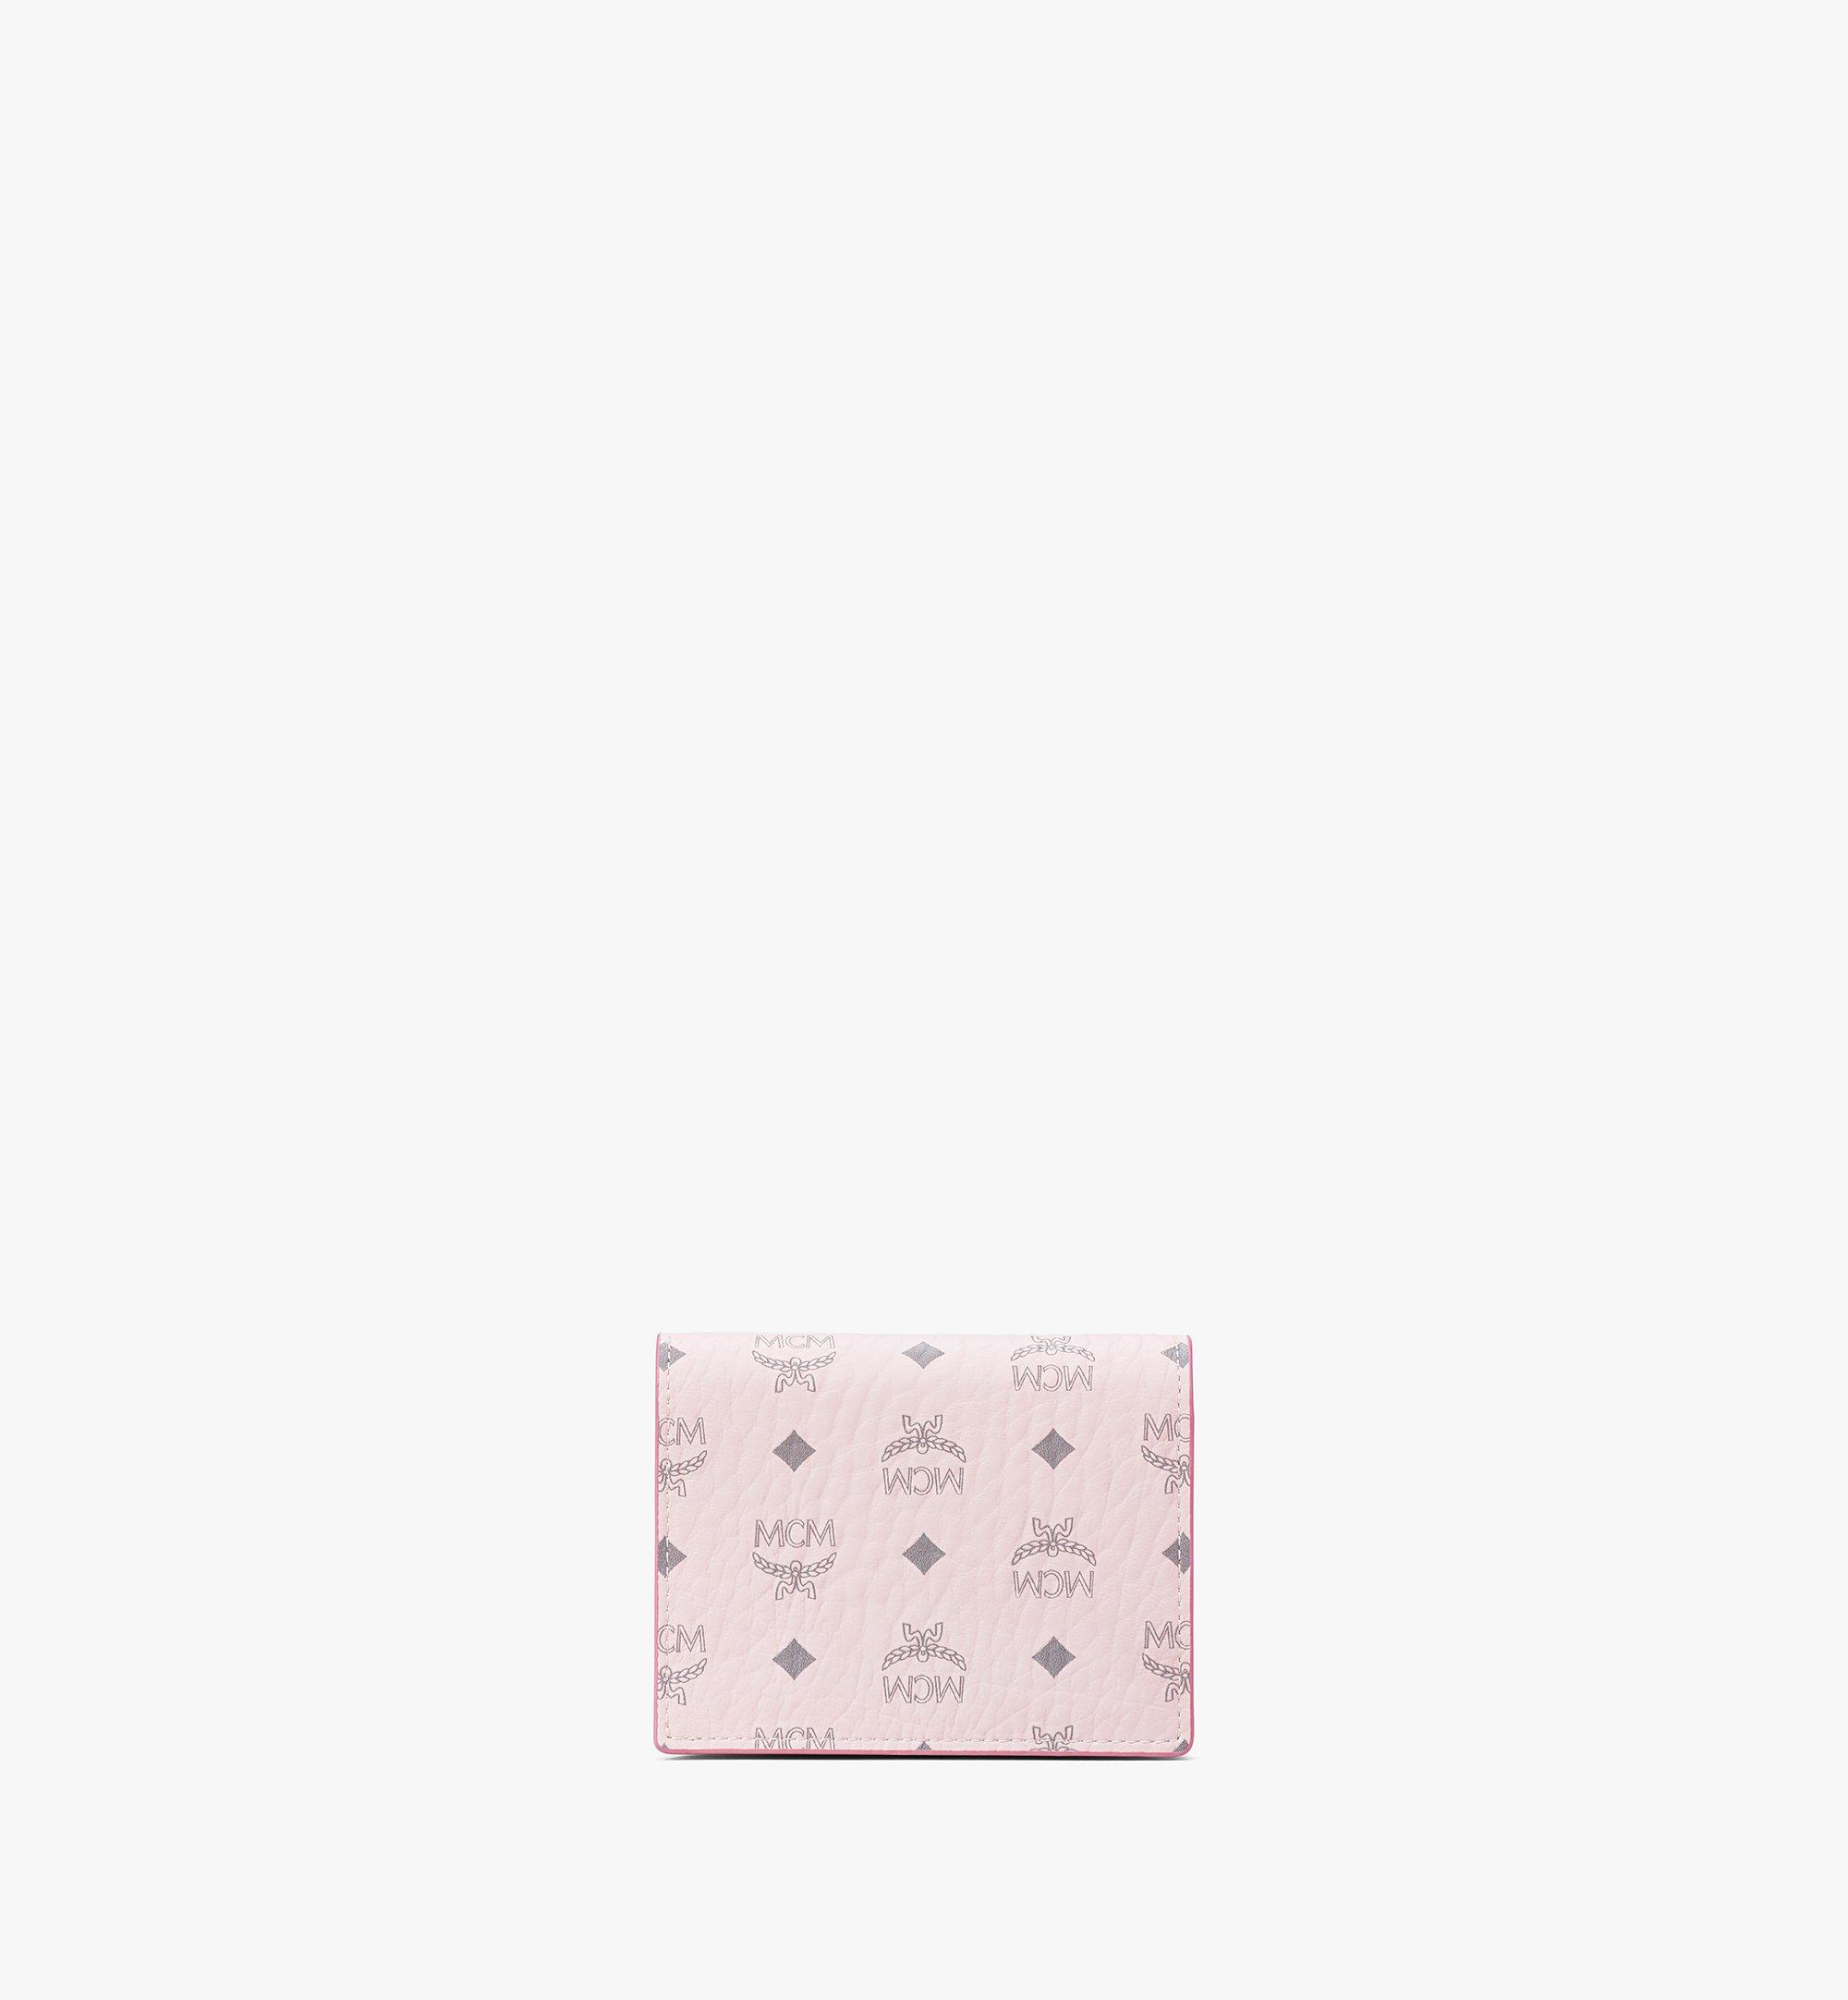 MCM Visetos Original链带钱包 Pink MYLAAVI02QH001 更多视角 2